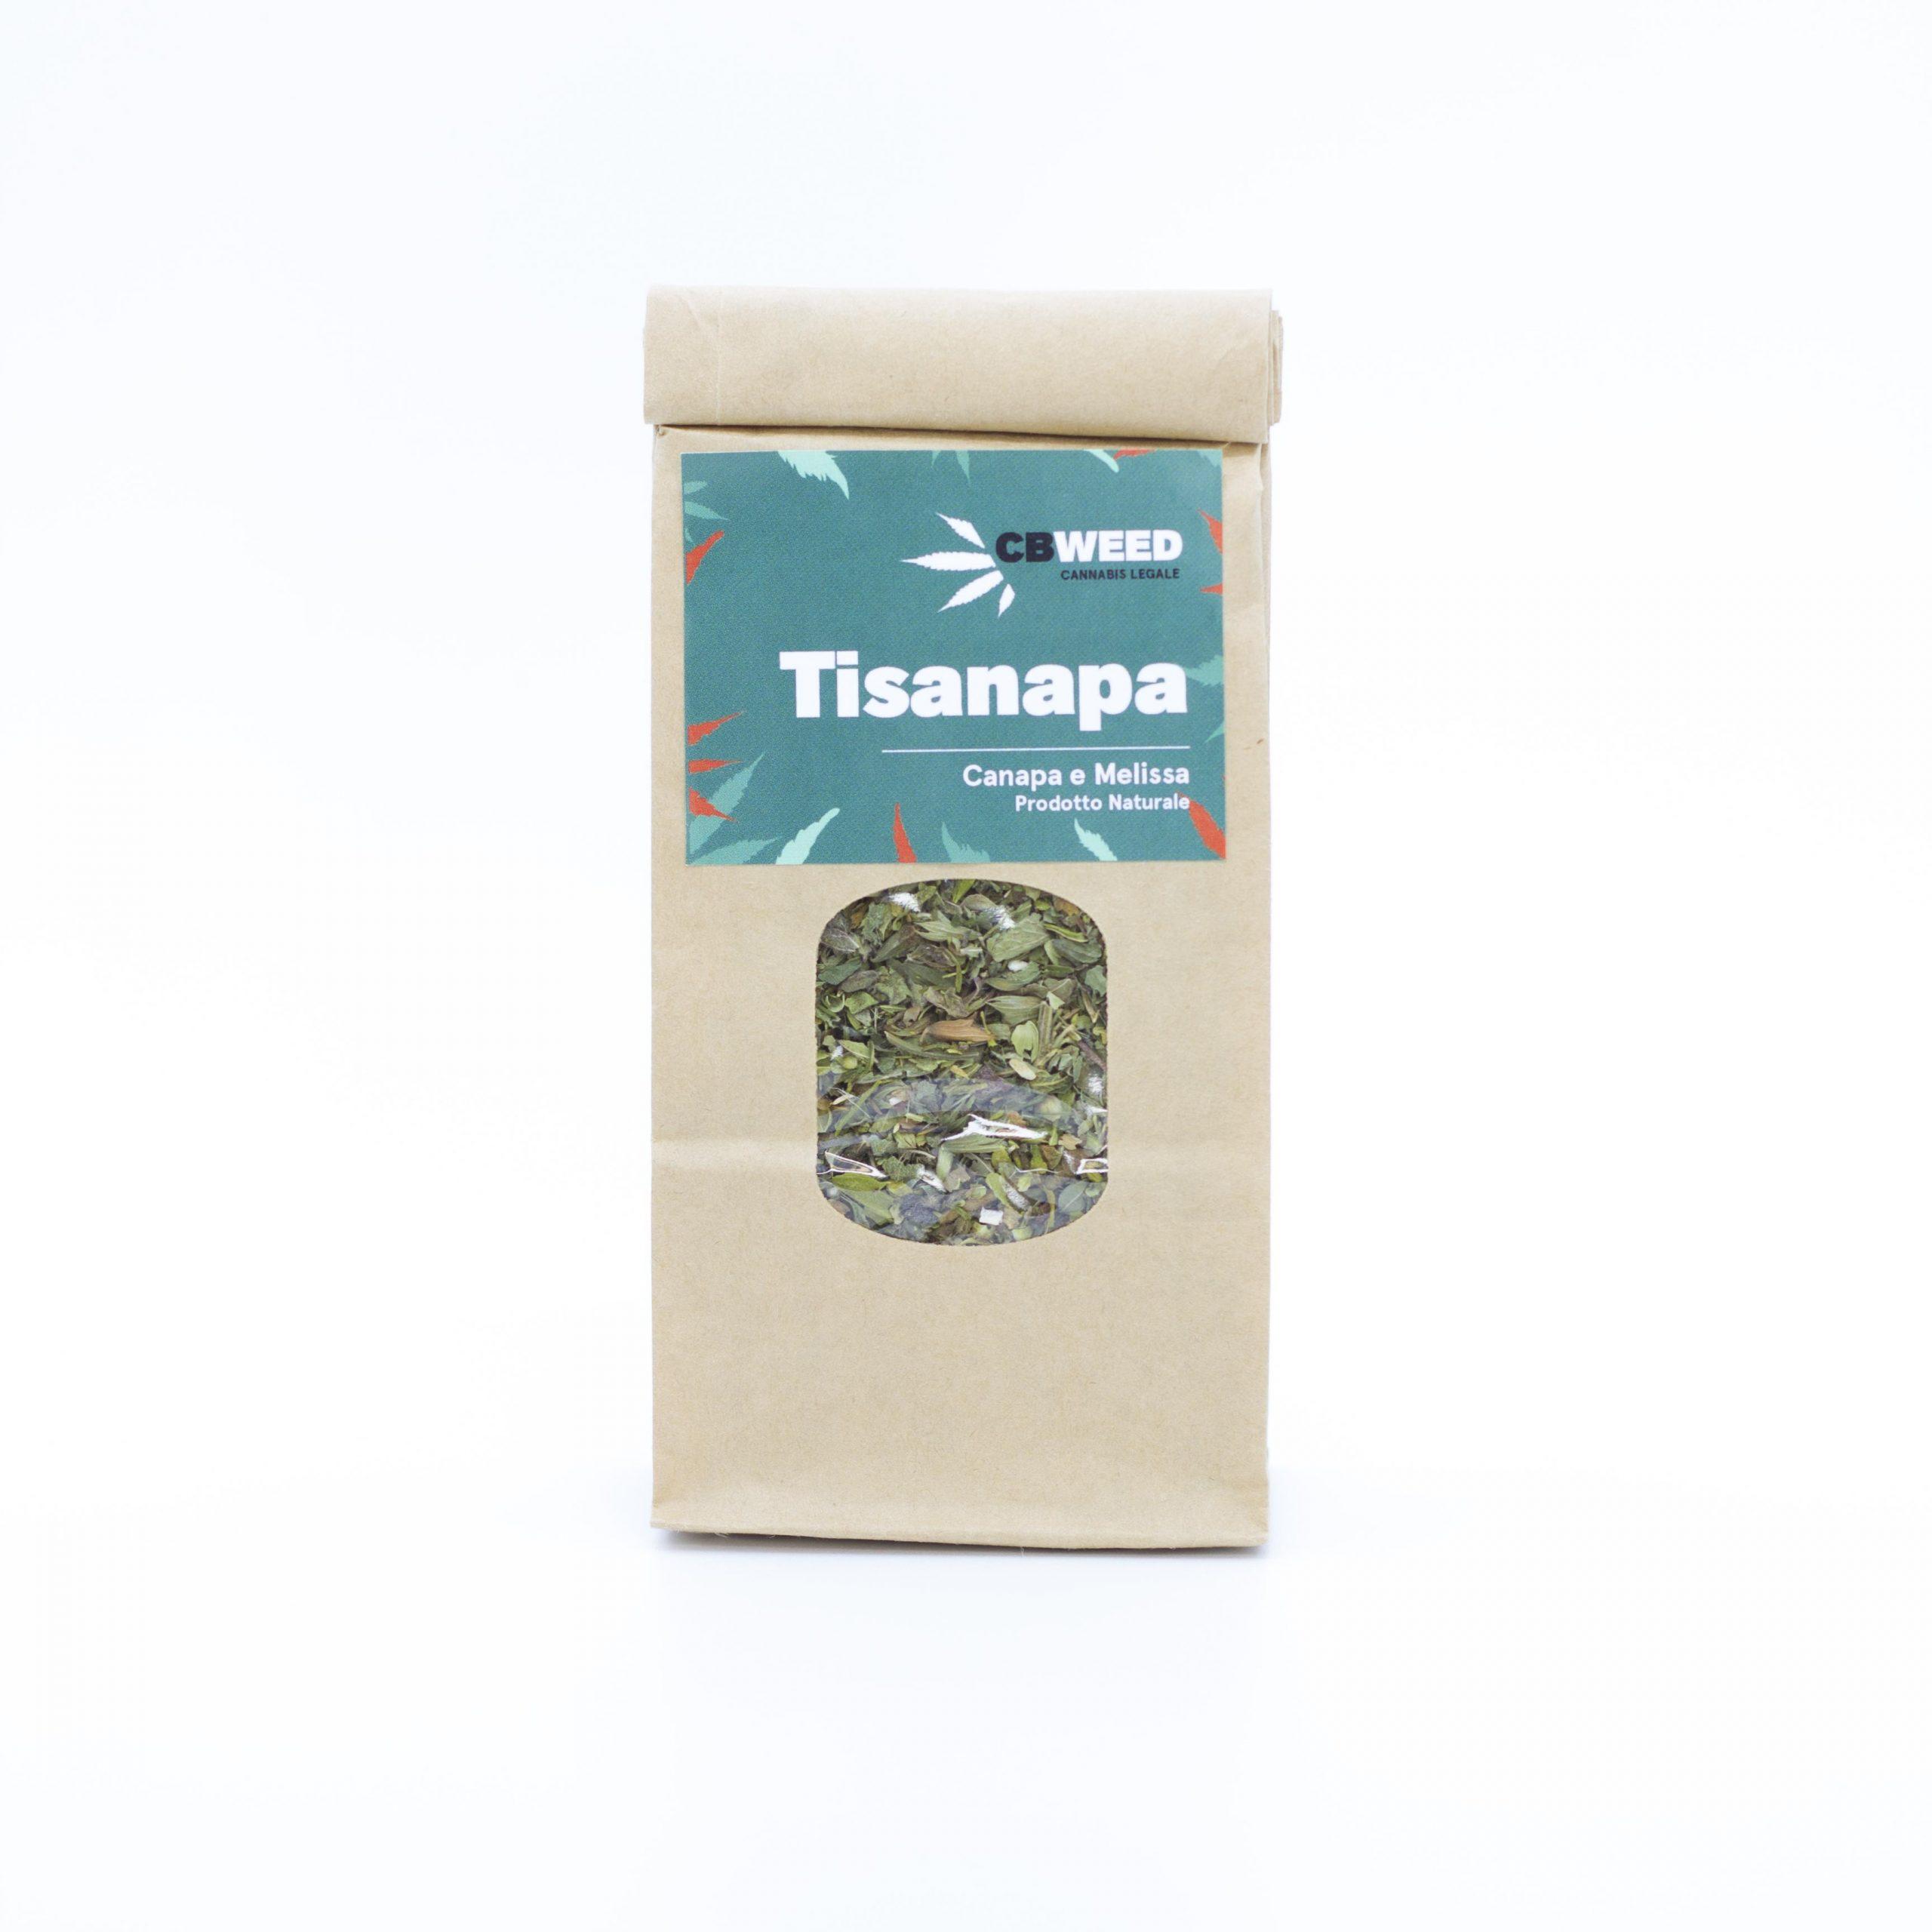 tisanapa melissa A WEB scaled - Tisanapa - Melissa